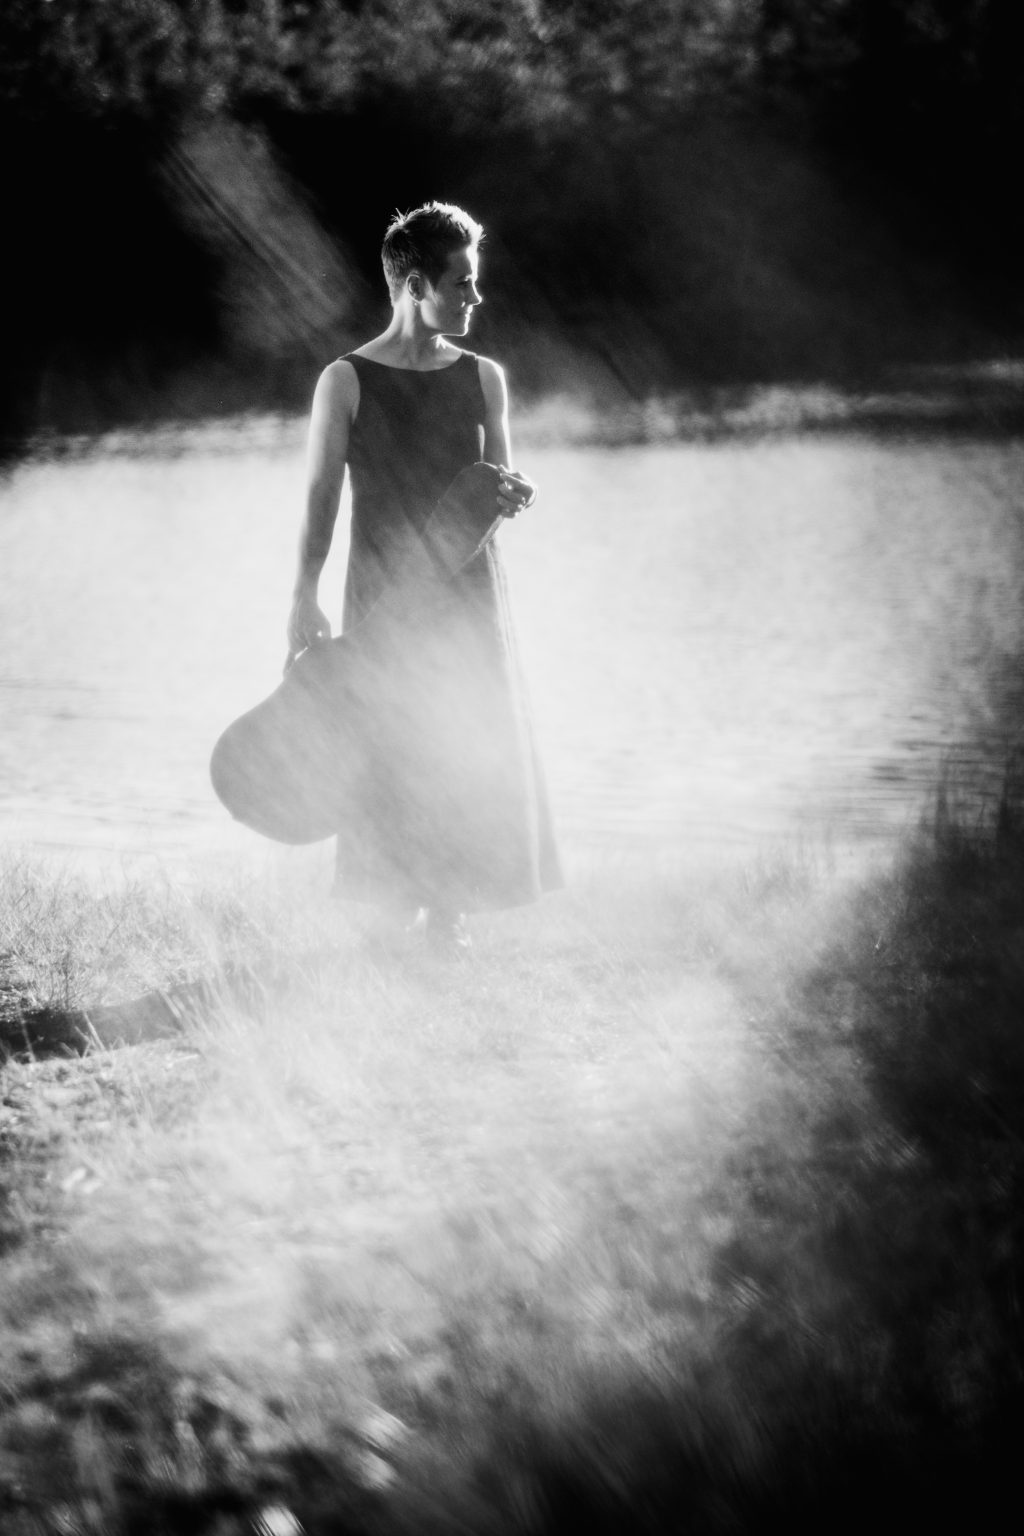 Désirée Saarela, Photo: Andreas Haals